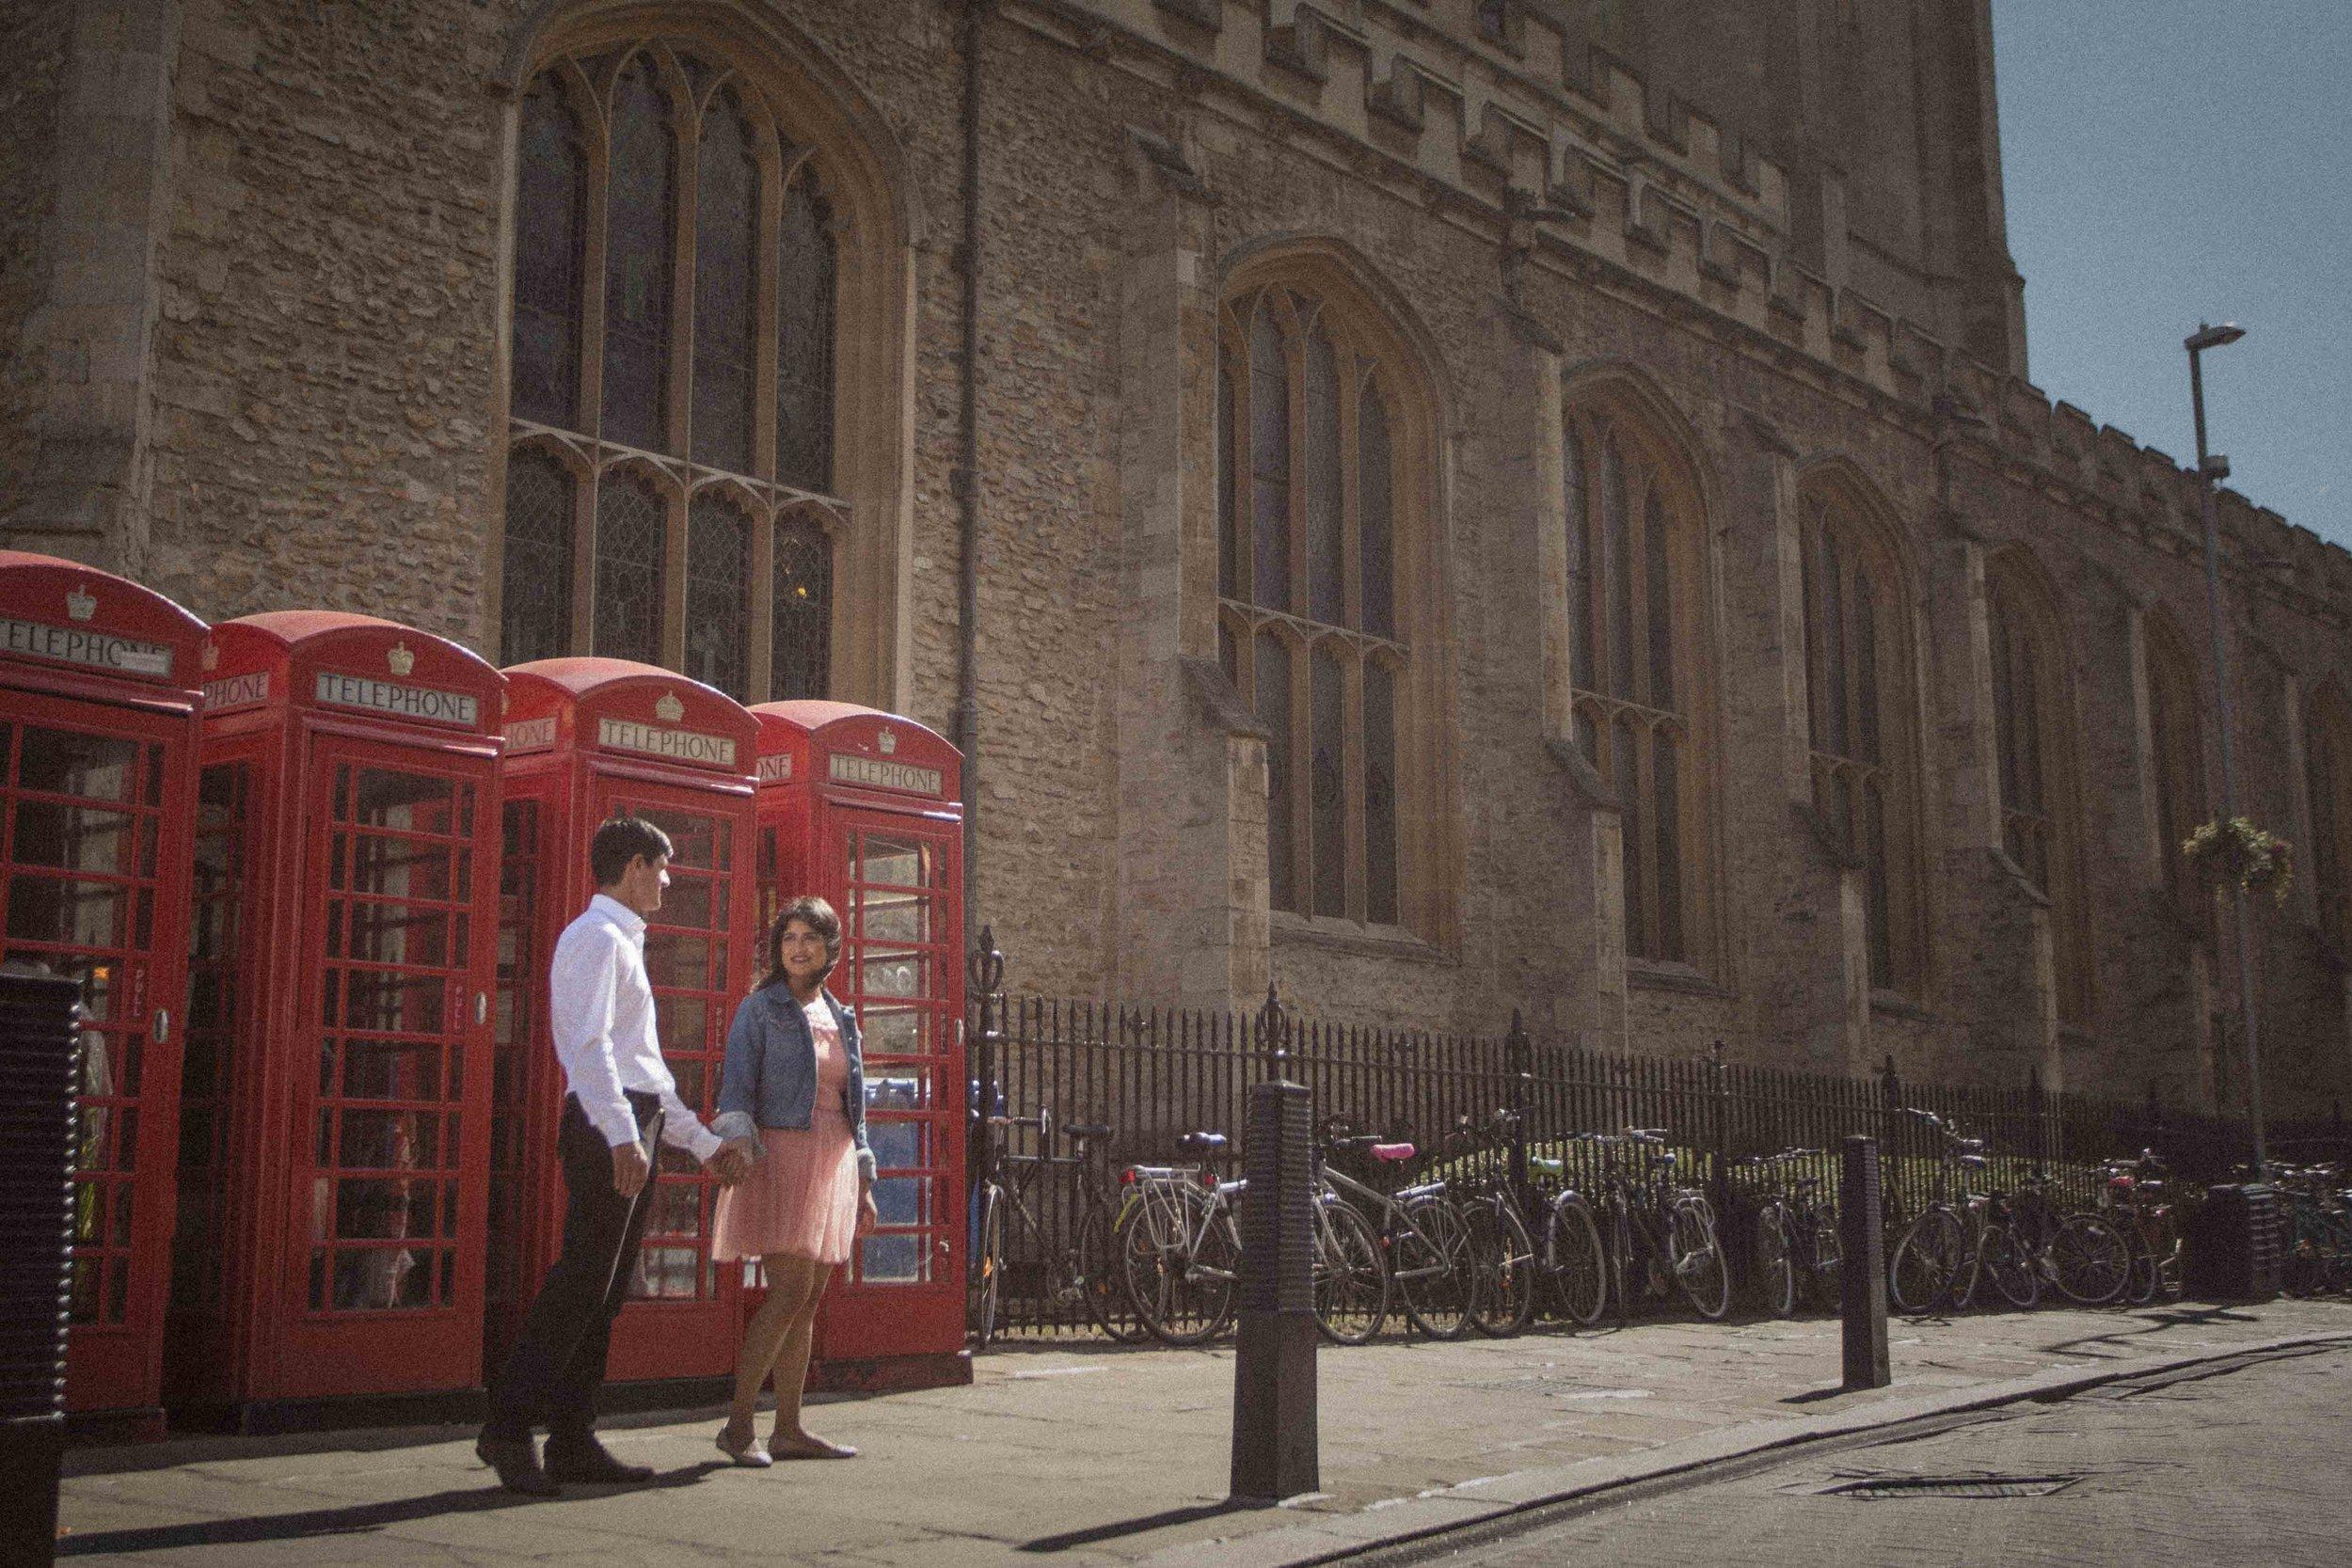 cambridge-pre-wedding-prewedding-engagement-photoshoot-shoot-photographer-asian-wedding-natalia-smith-photography-16.jpg